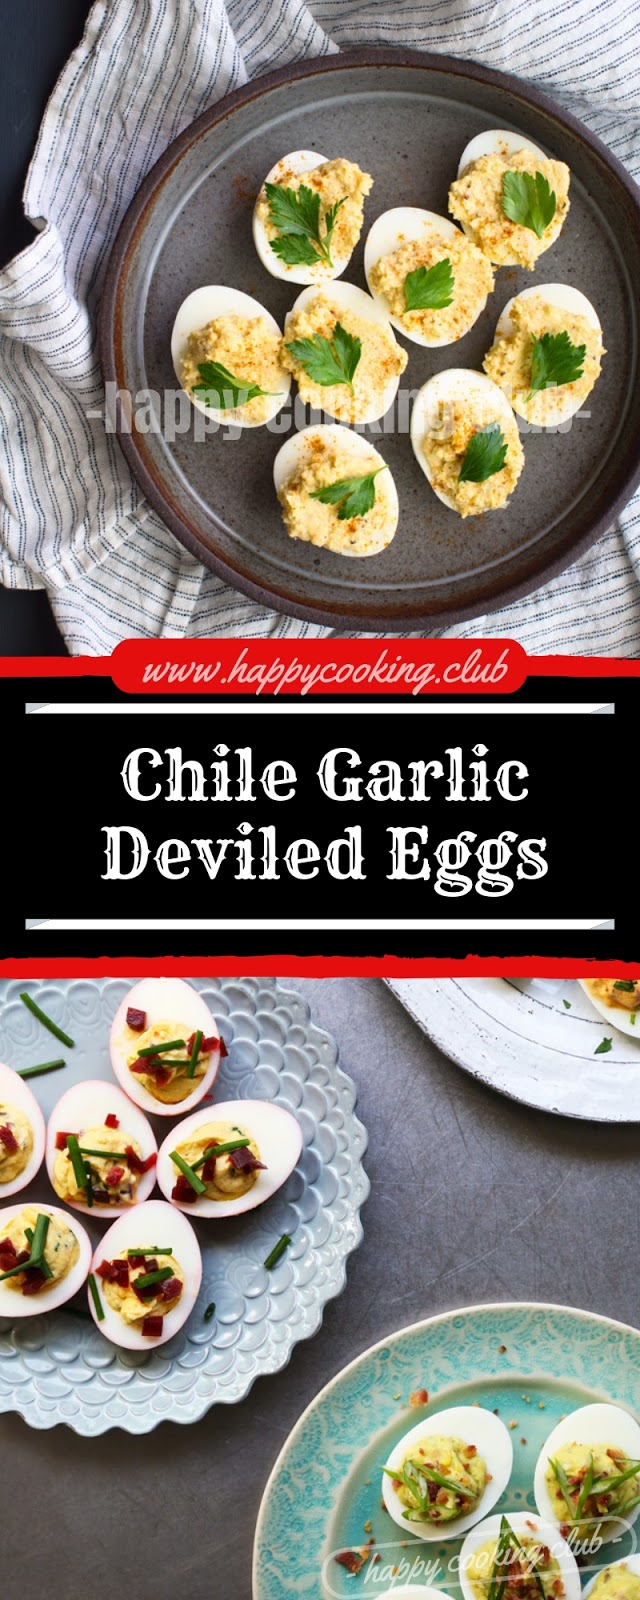 Chile Garlic Deviled Eggs